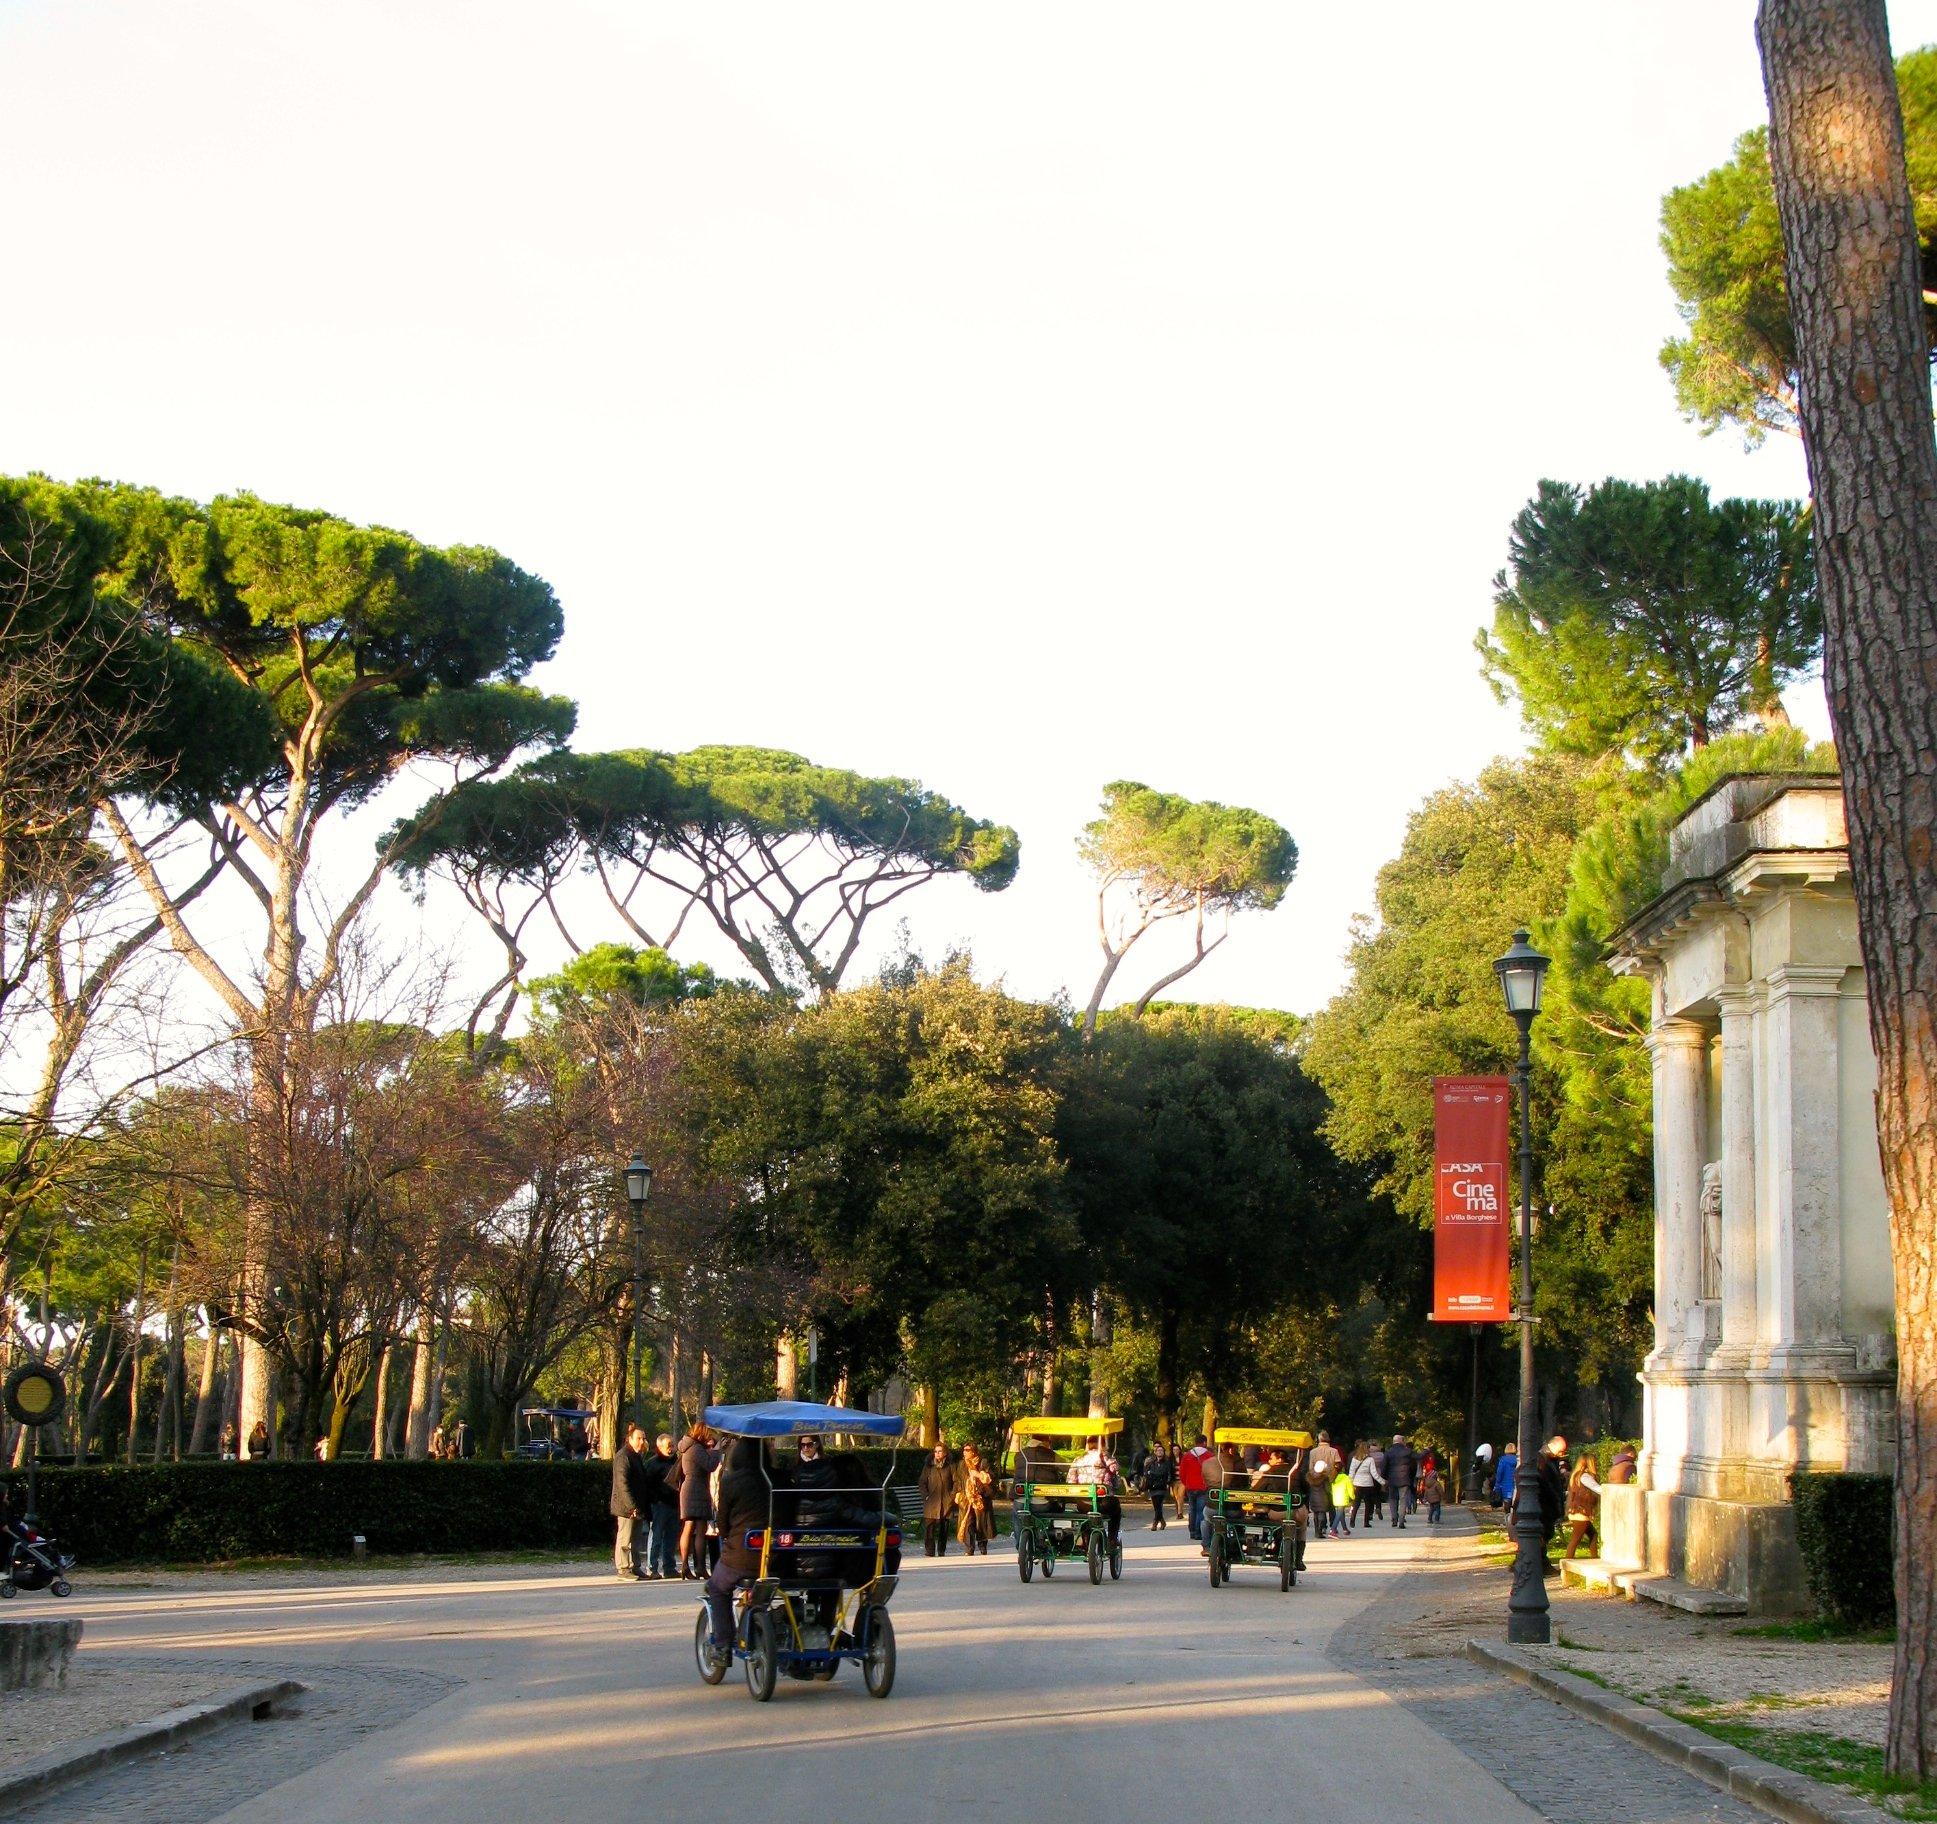 Villa Borghese Rooma